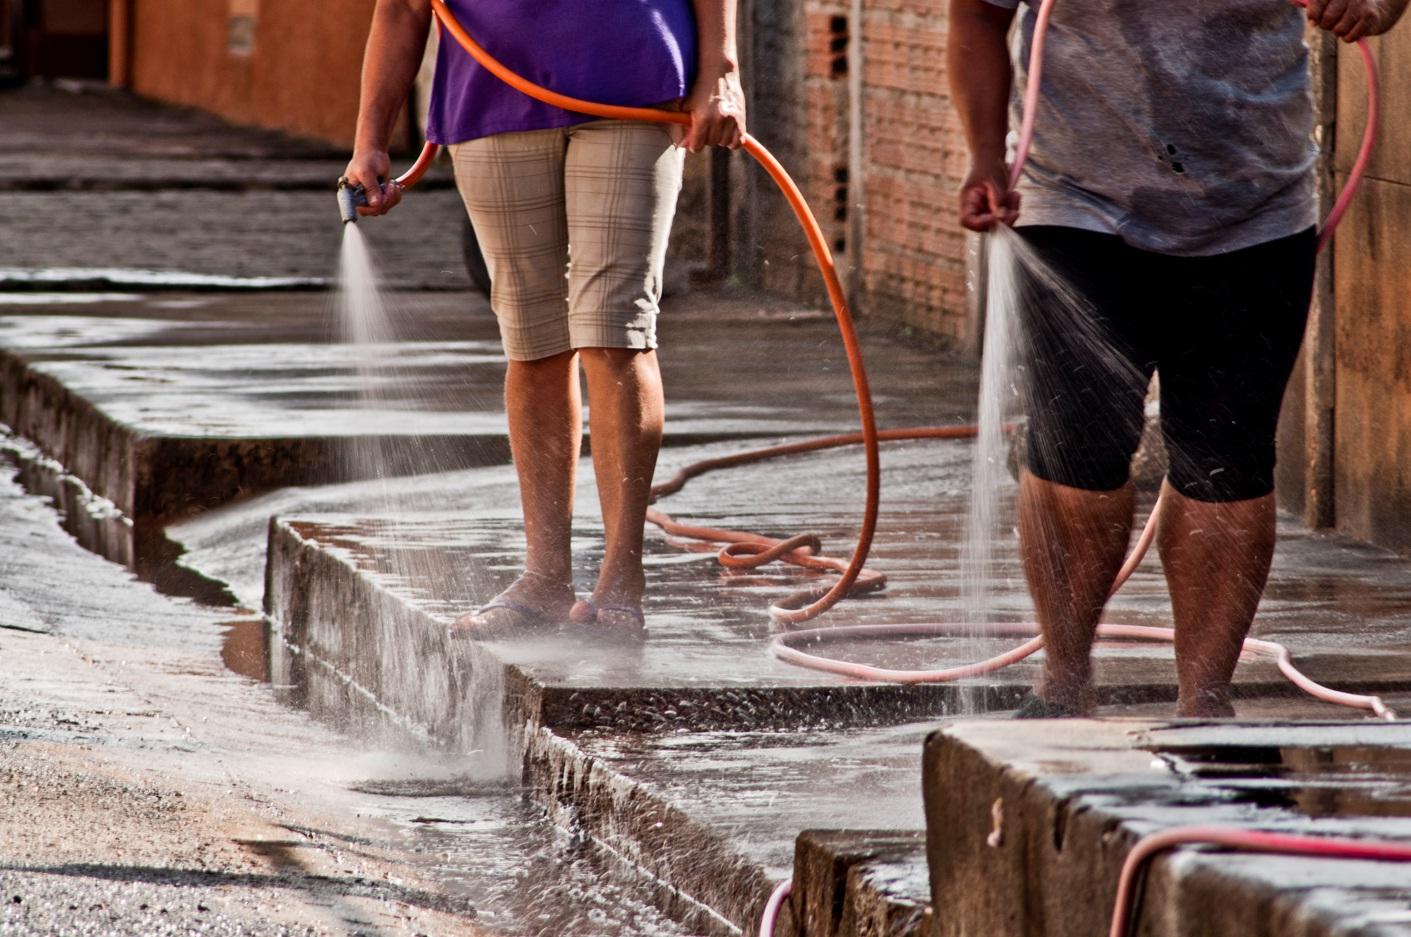 Dagma anunció multas para quienes desperdicien agua en Cali